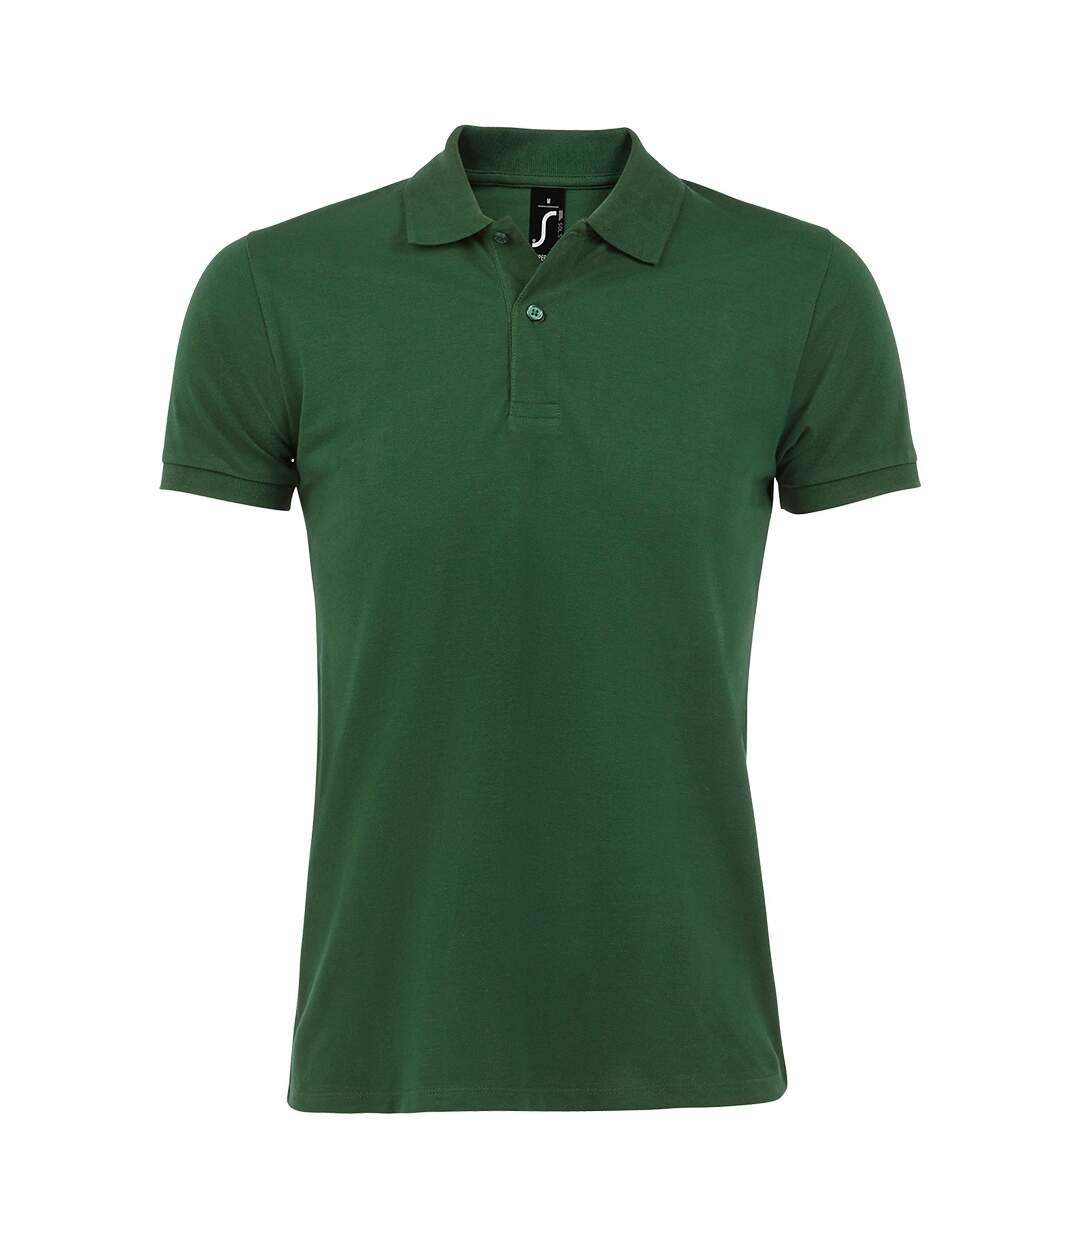 SOLS Mens Perfect Pique Short Sleeve Polo Shirt (Bottle Green) - UTPC283